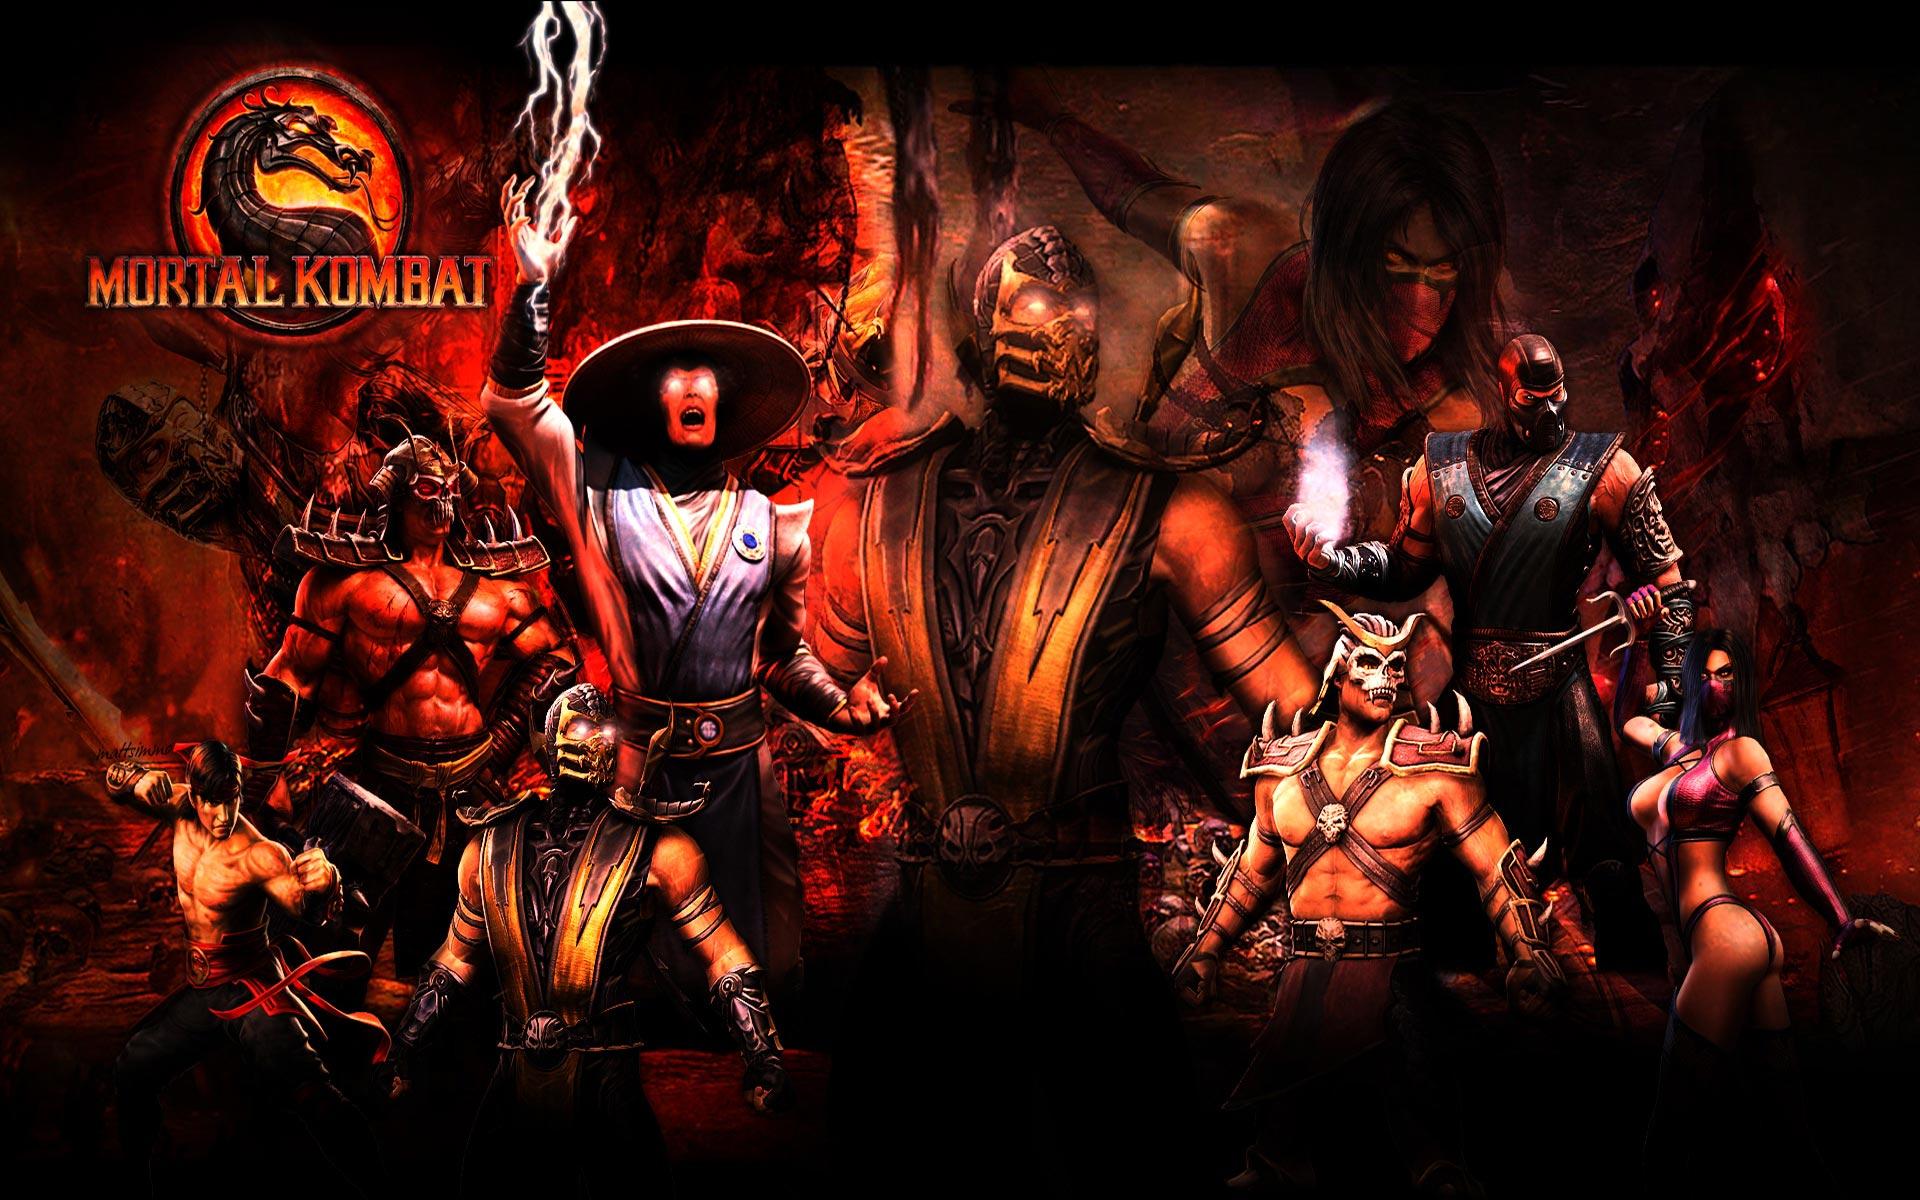 Mortal Kombat Wallpapers   Taringa 1920x1200